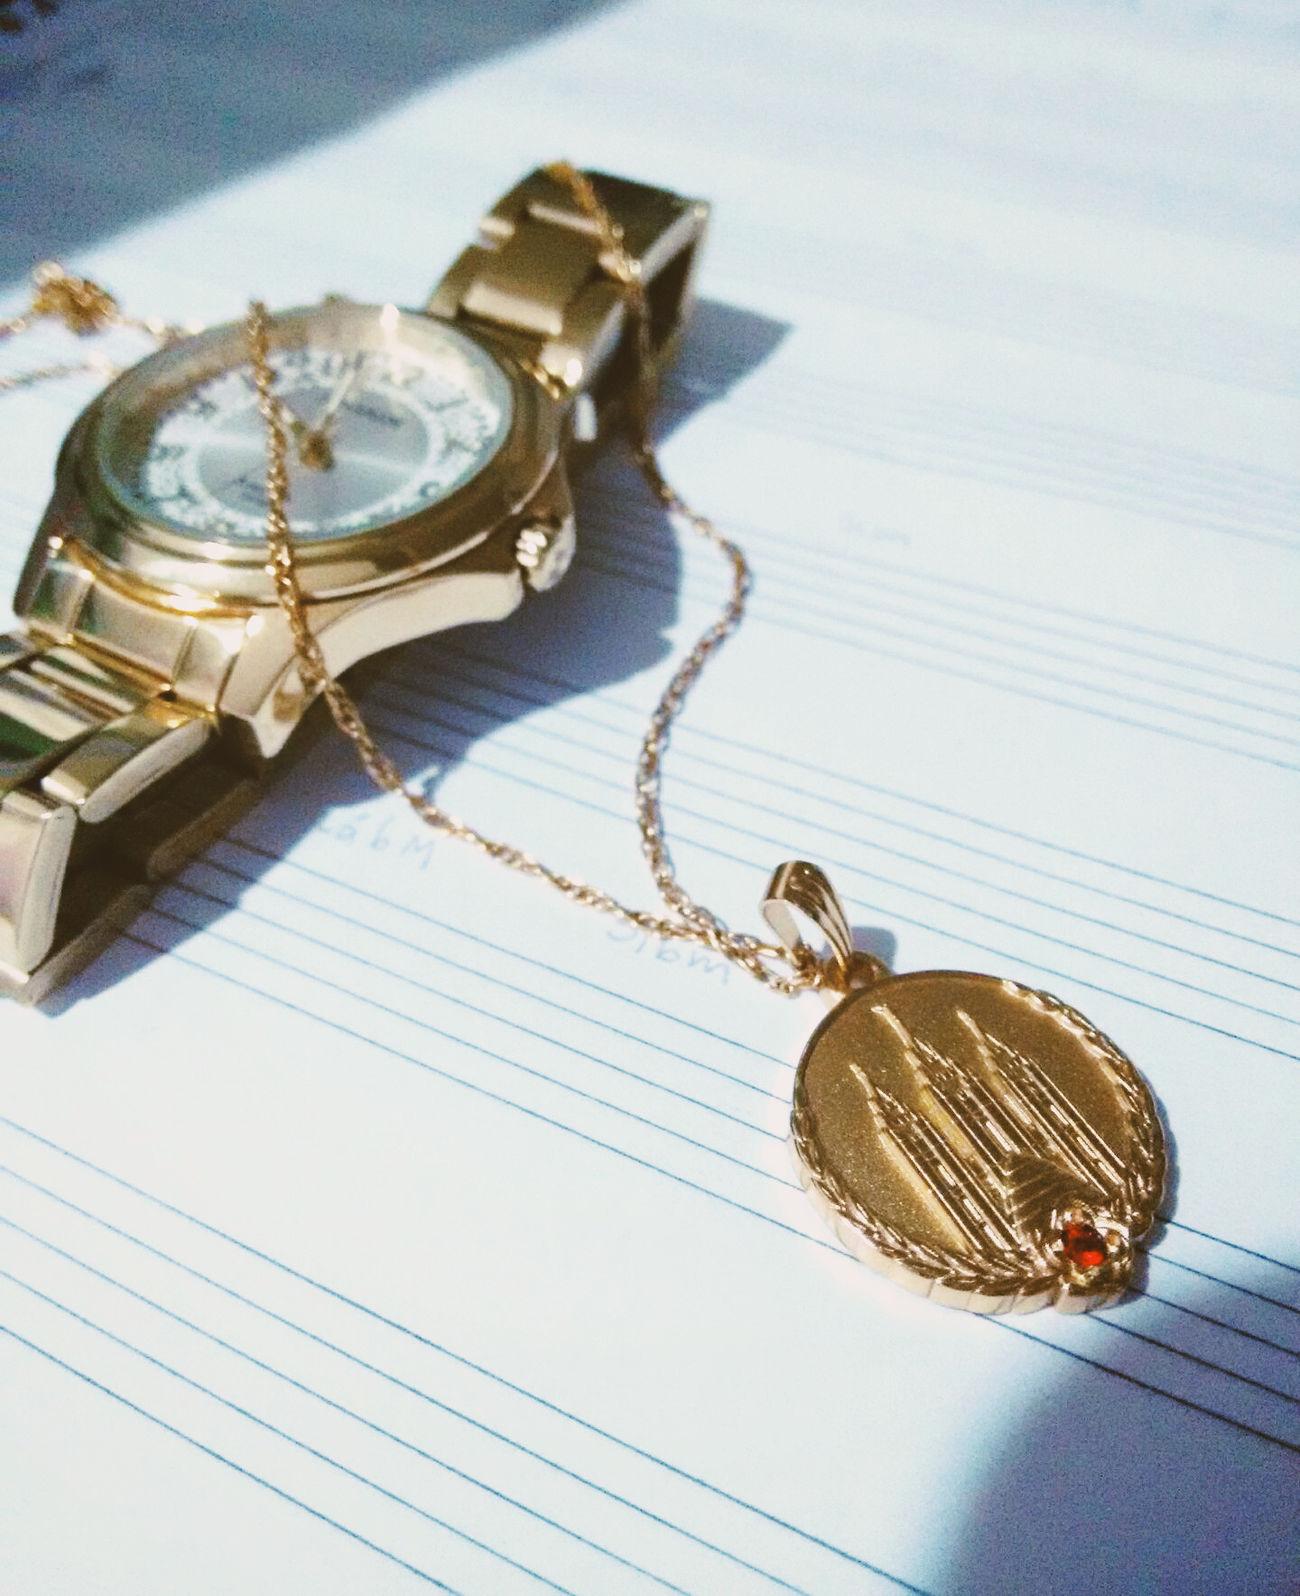 Lds Medallion Virtue Goals ❤️❤️❤️❤️ Purity Necklace Sud Mormon Life Mormon Mormongirl Mormons